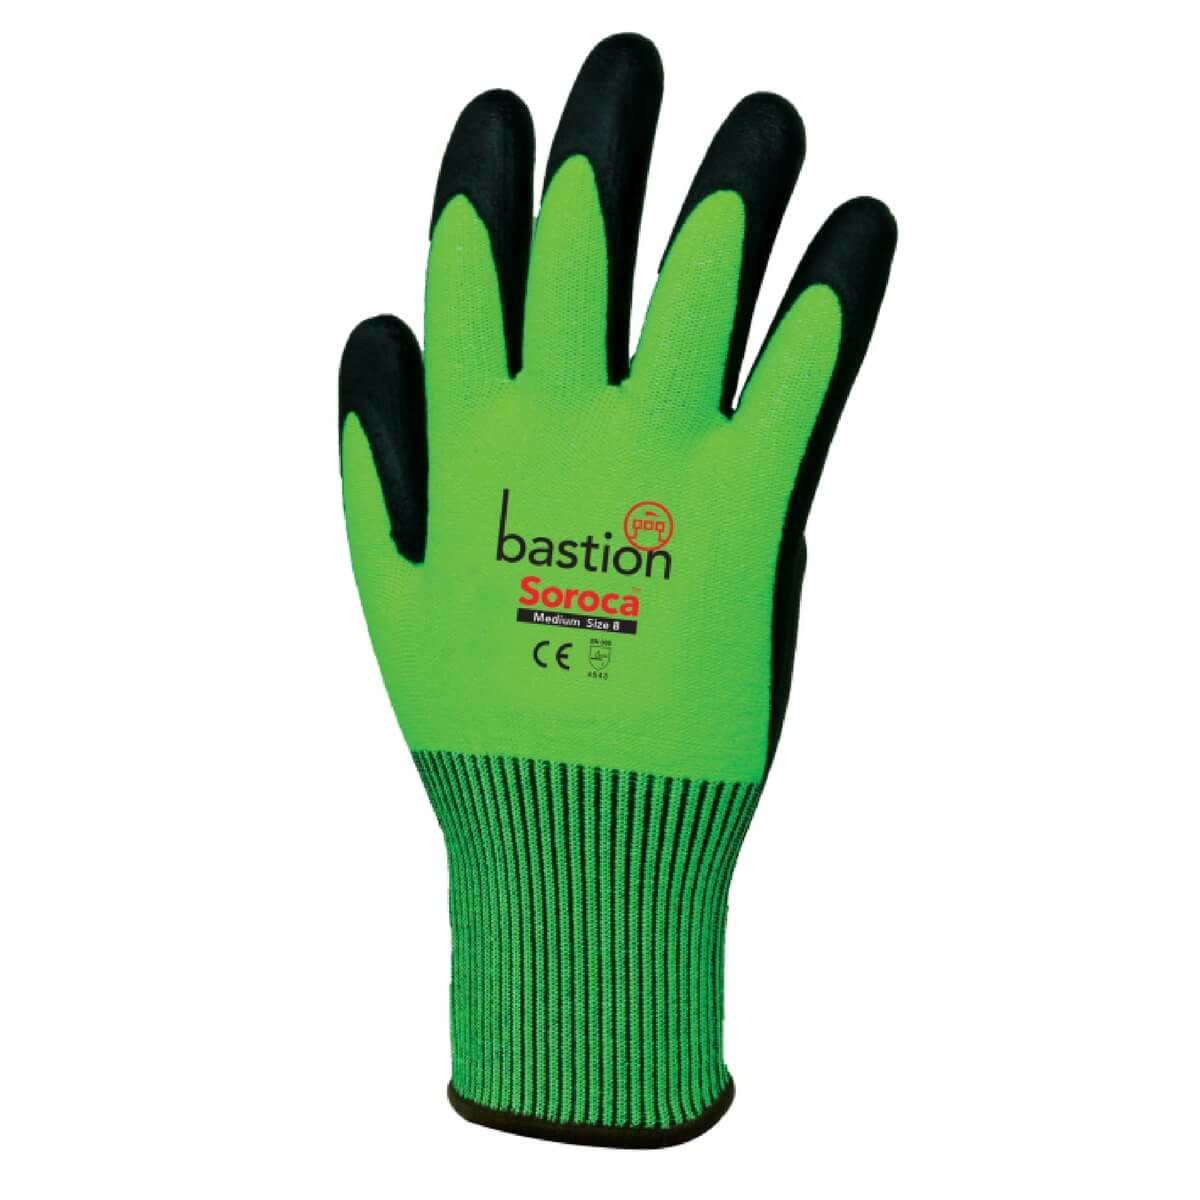 Bastion Soroca Hivis Cut Resistant Glove Badger Australia